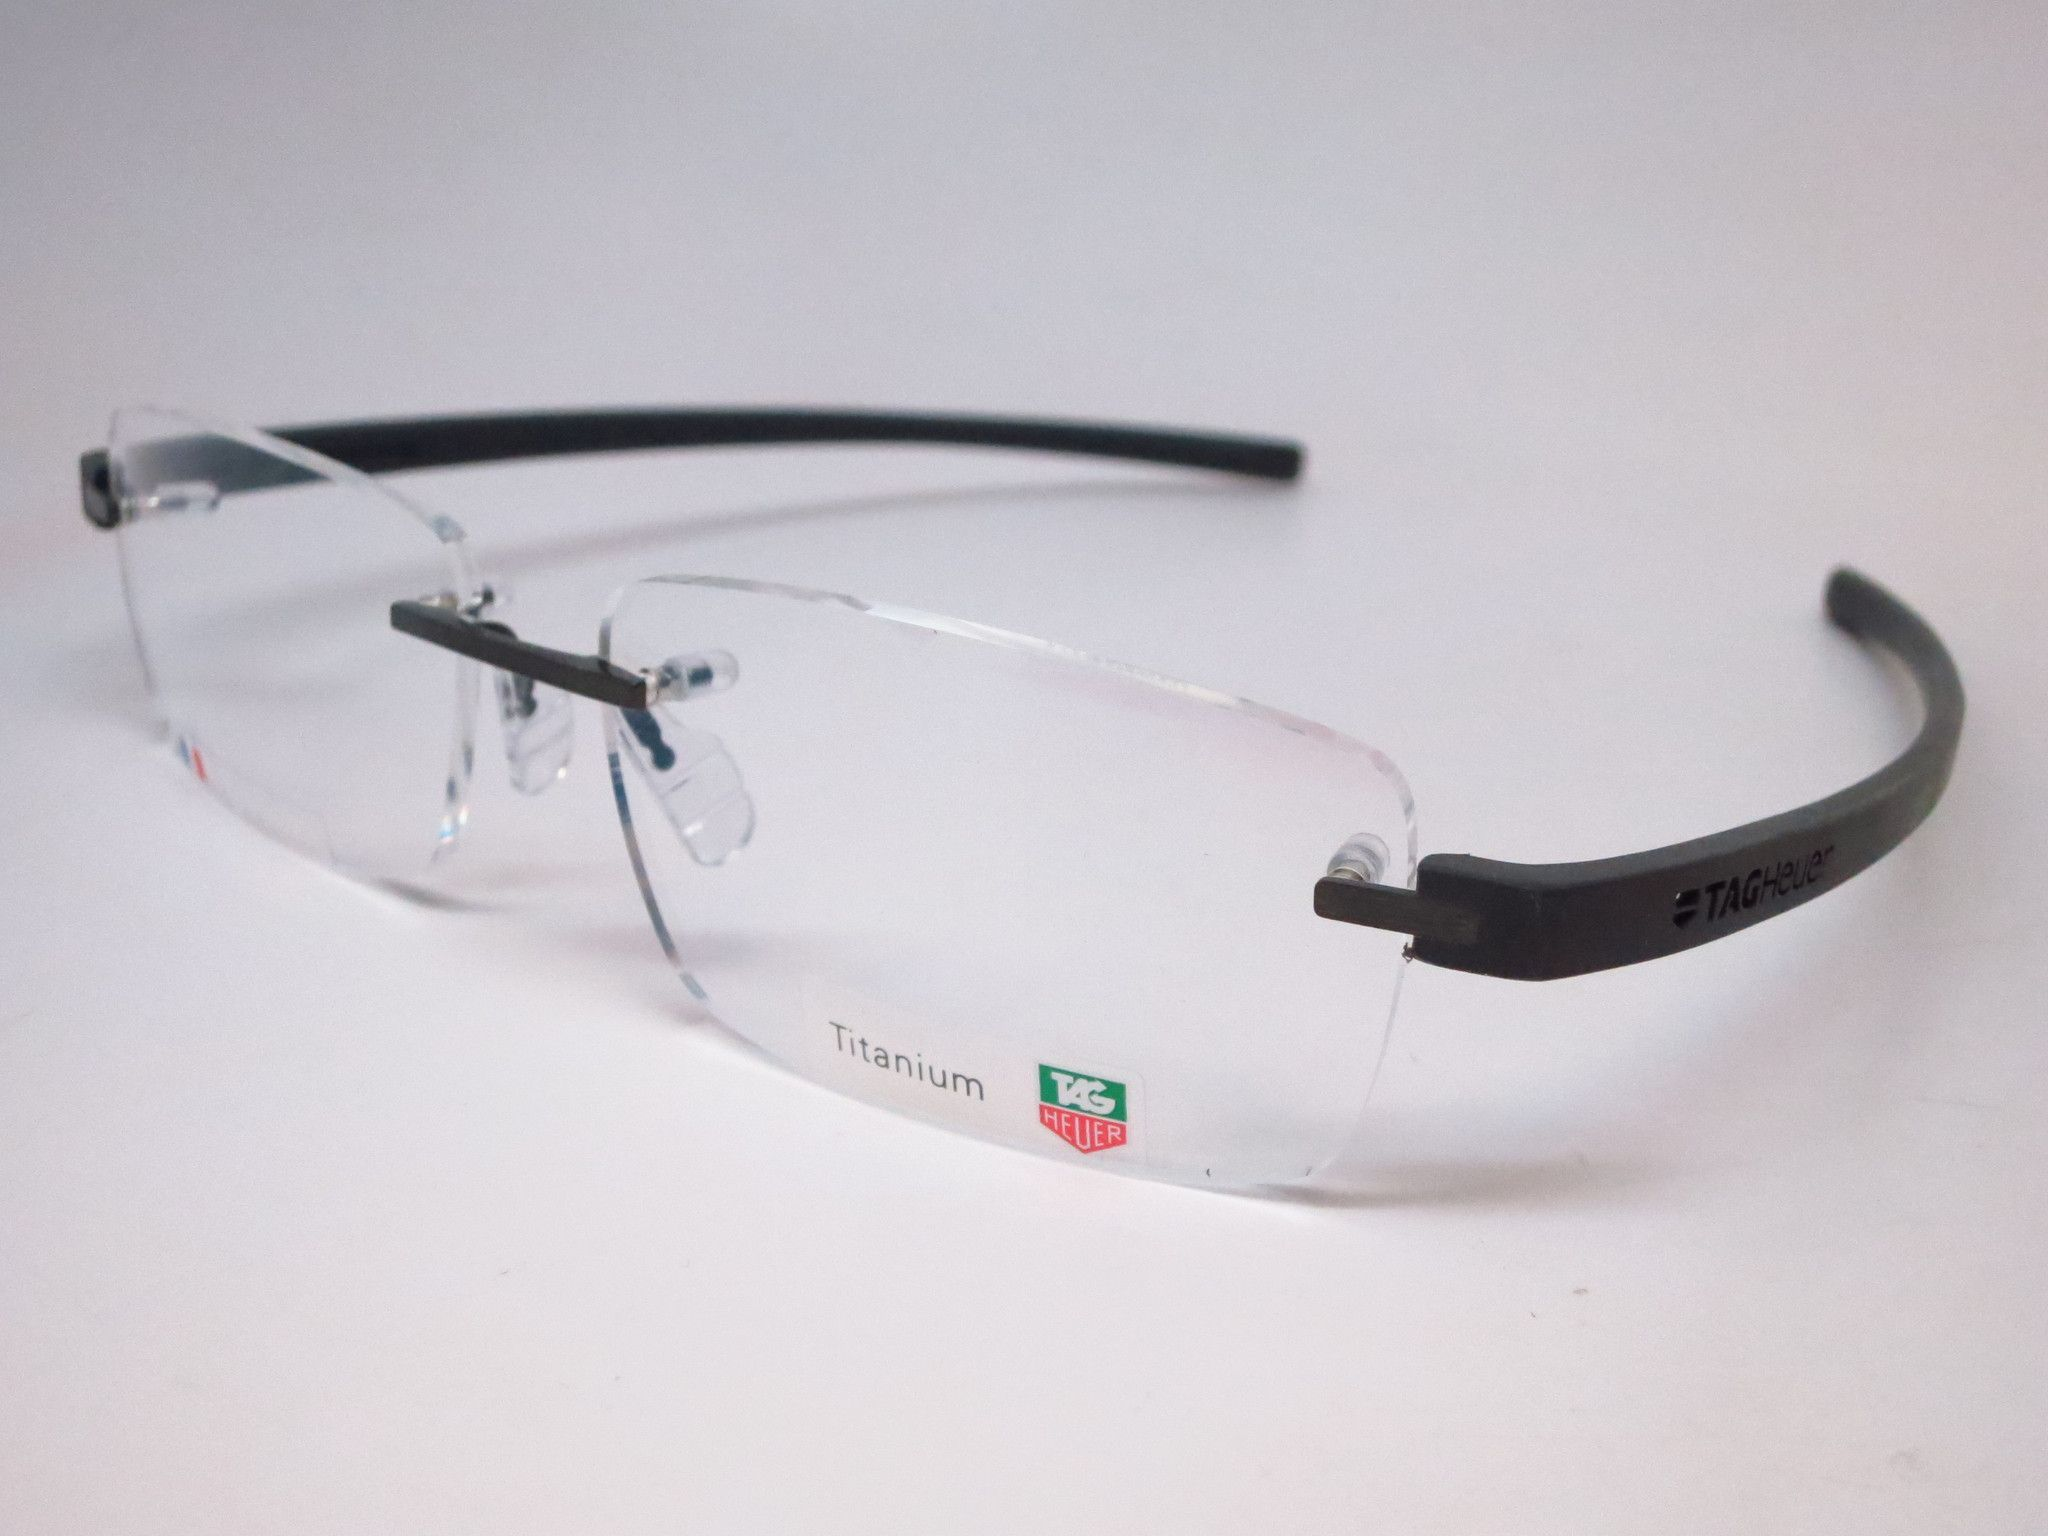 Tag heuer eyeglasses frames uk - Tag Heuer Th 3942 005 Black Gunmetal Reflex 3 Rimless Eyeglasses